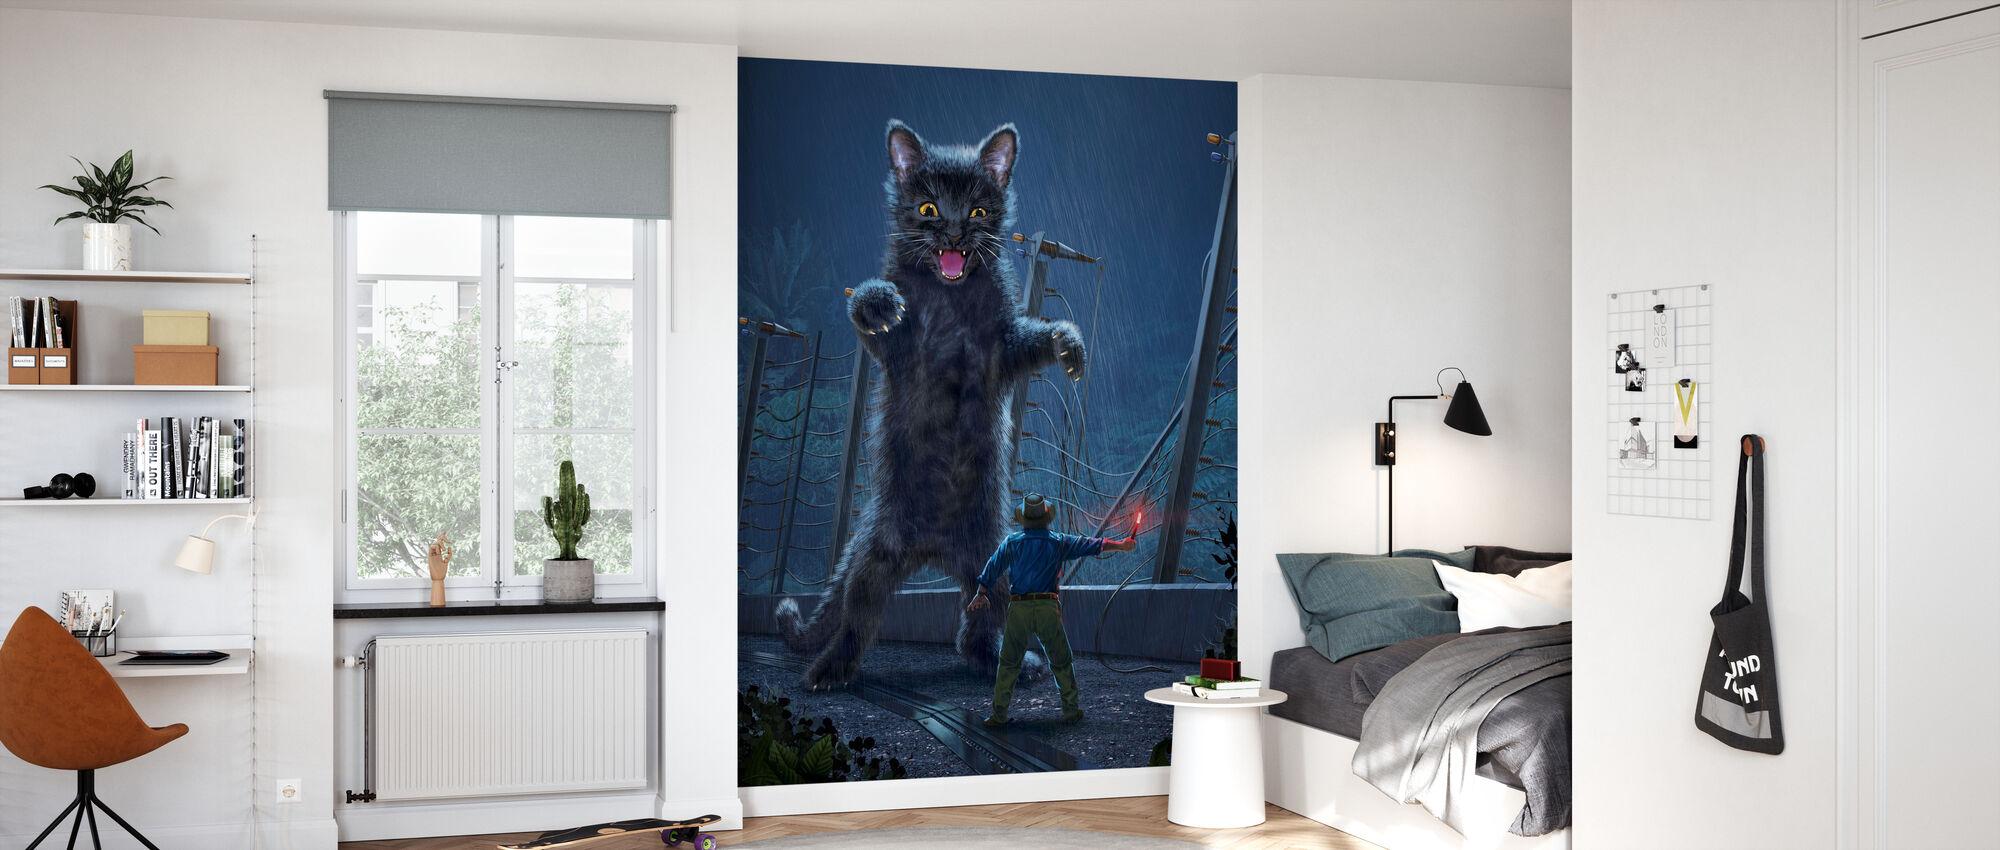 Jurassic Kitty - Wallpaper - Kids Room